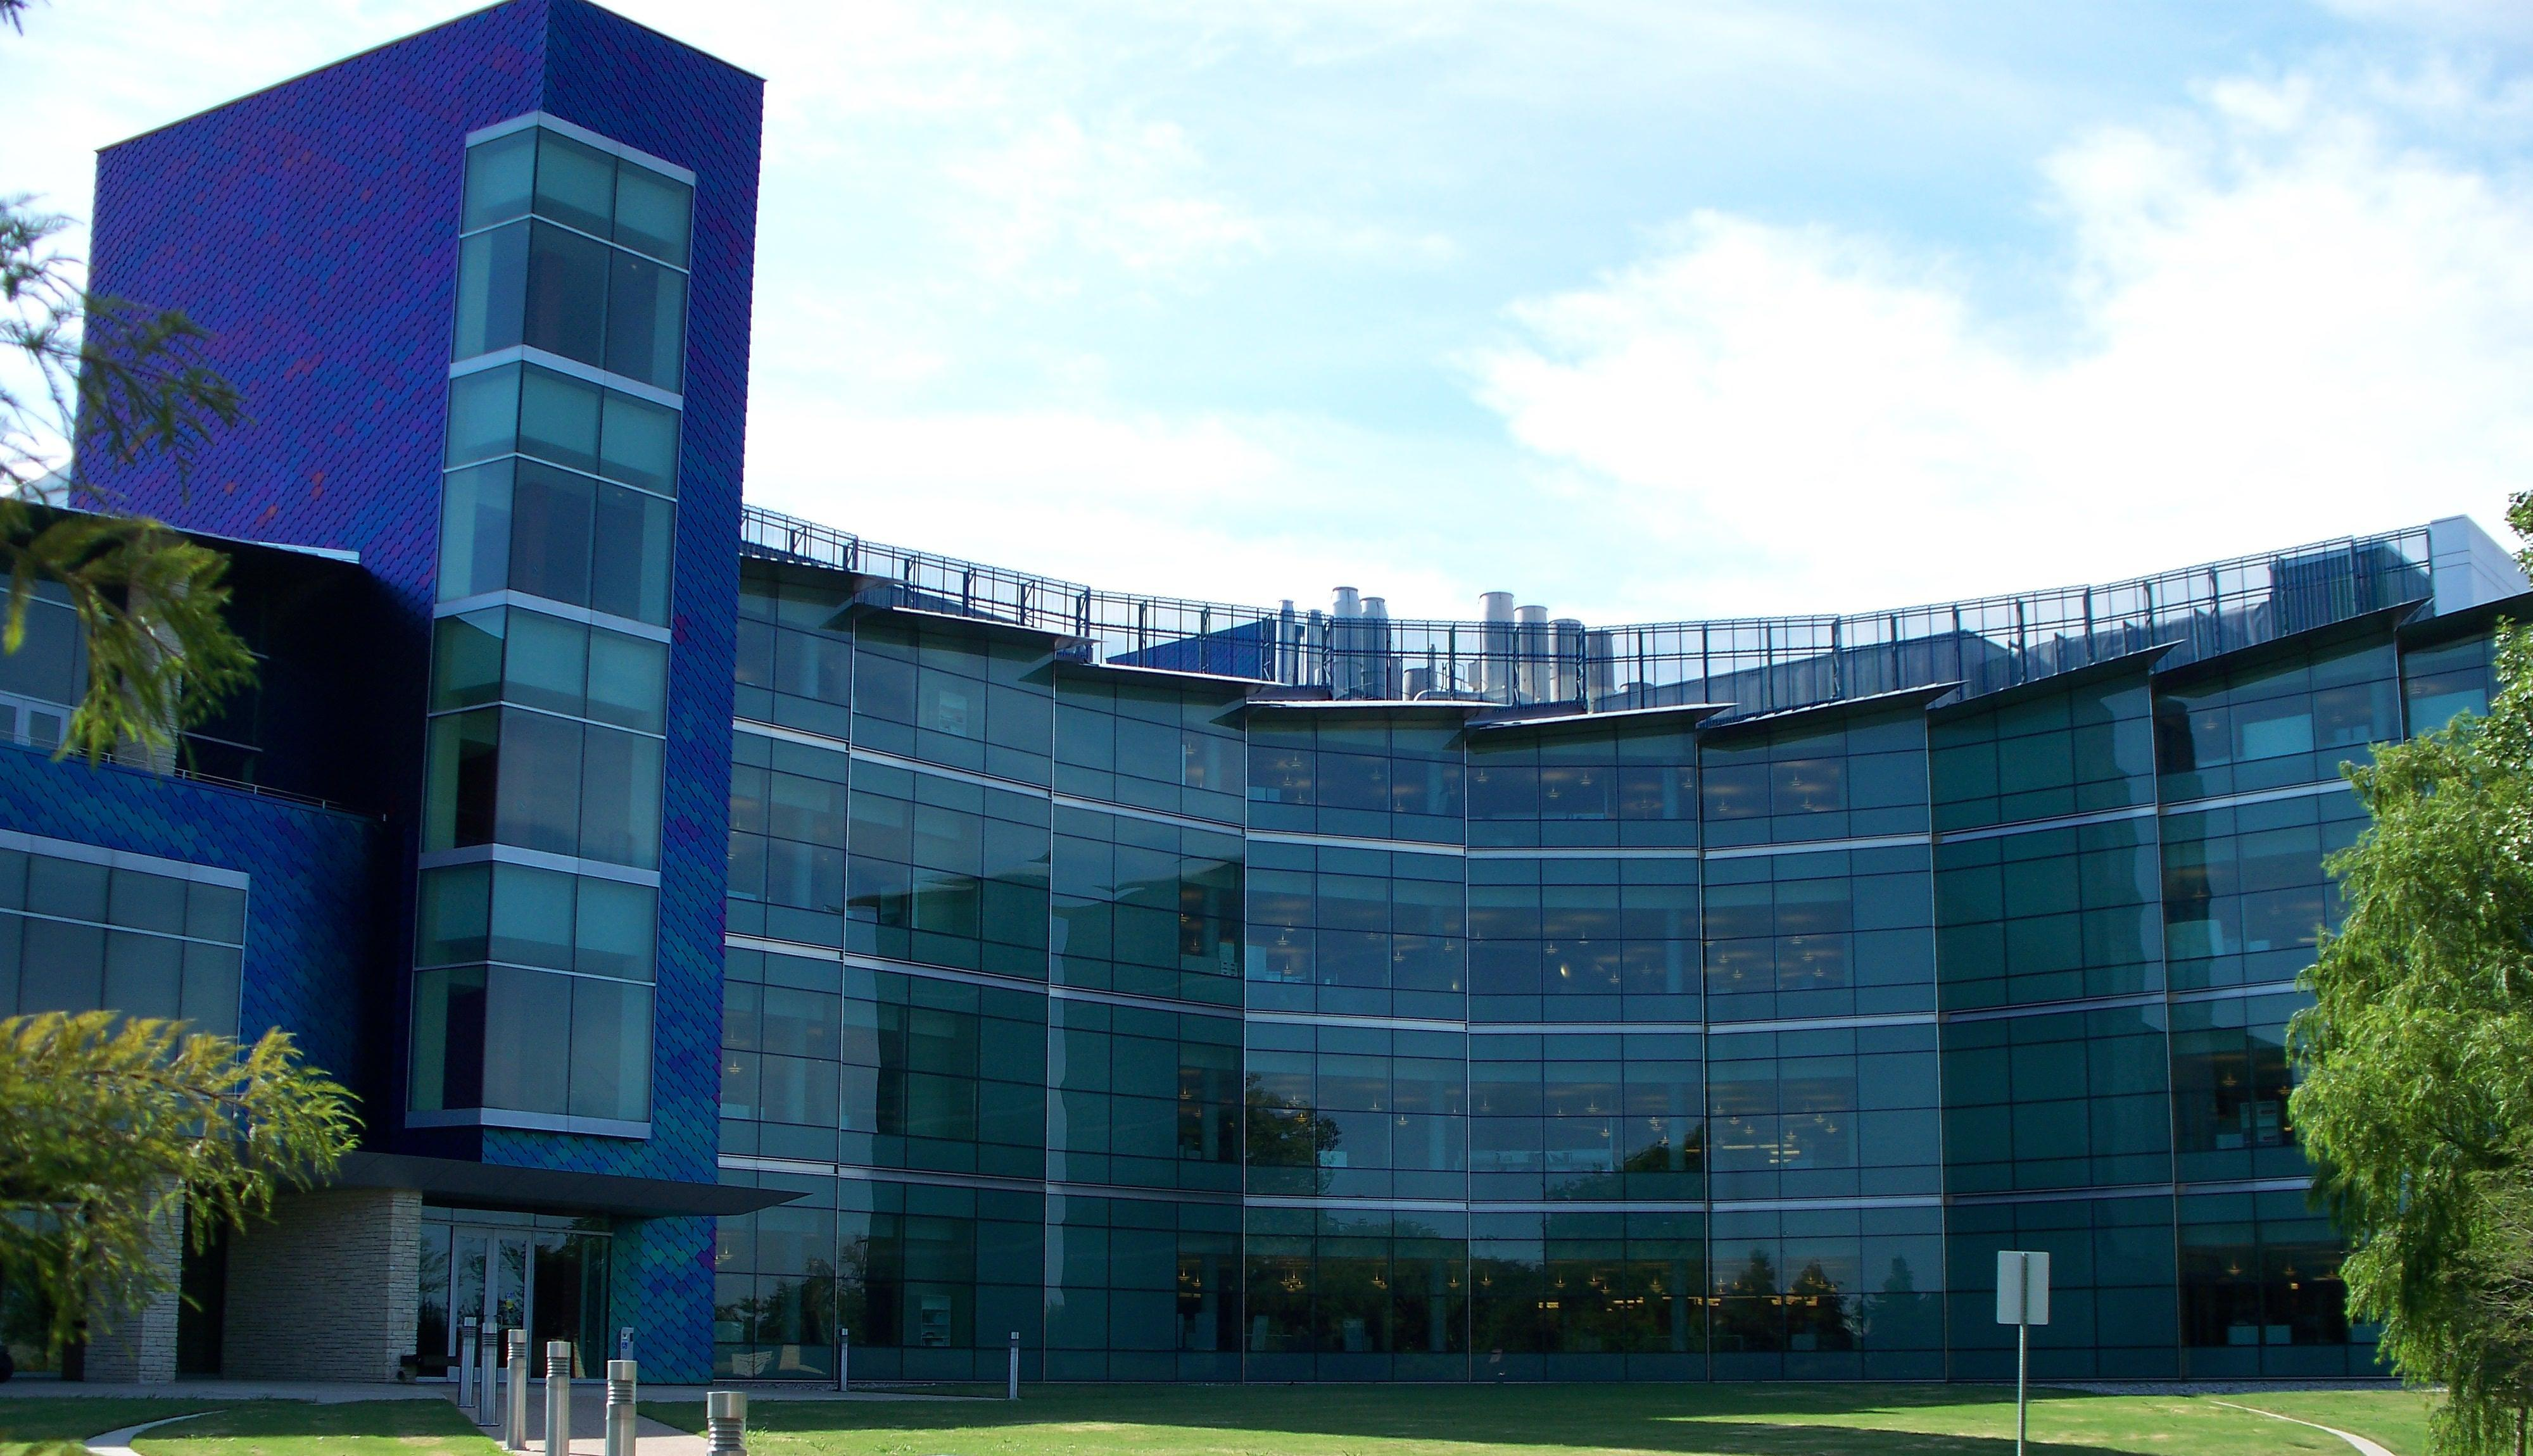 UT Dallas Admission Requirements - PrepScholar